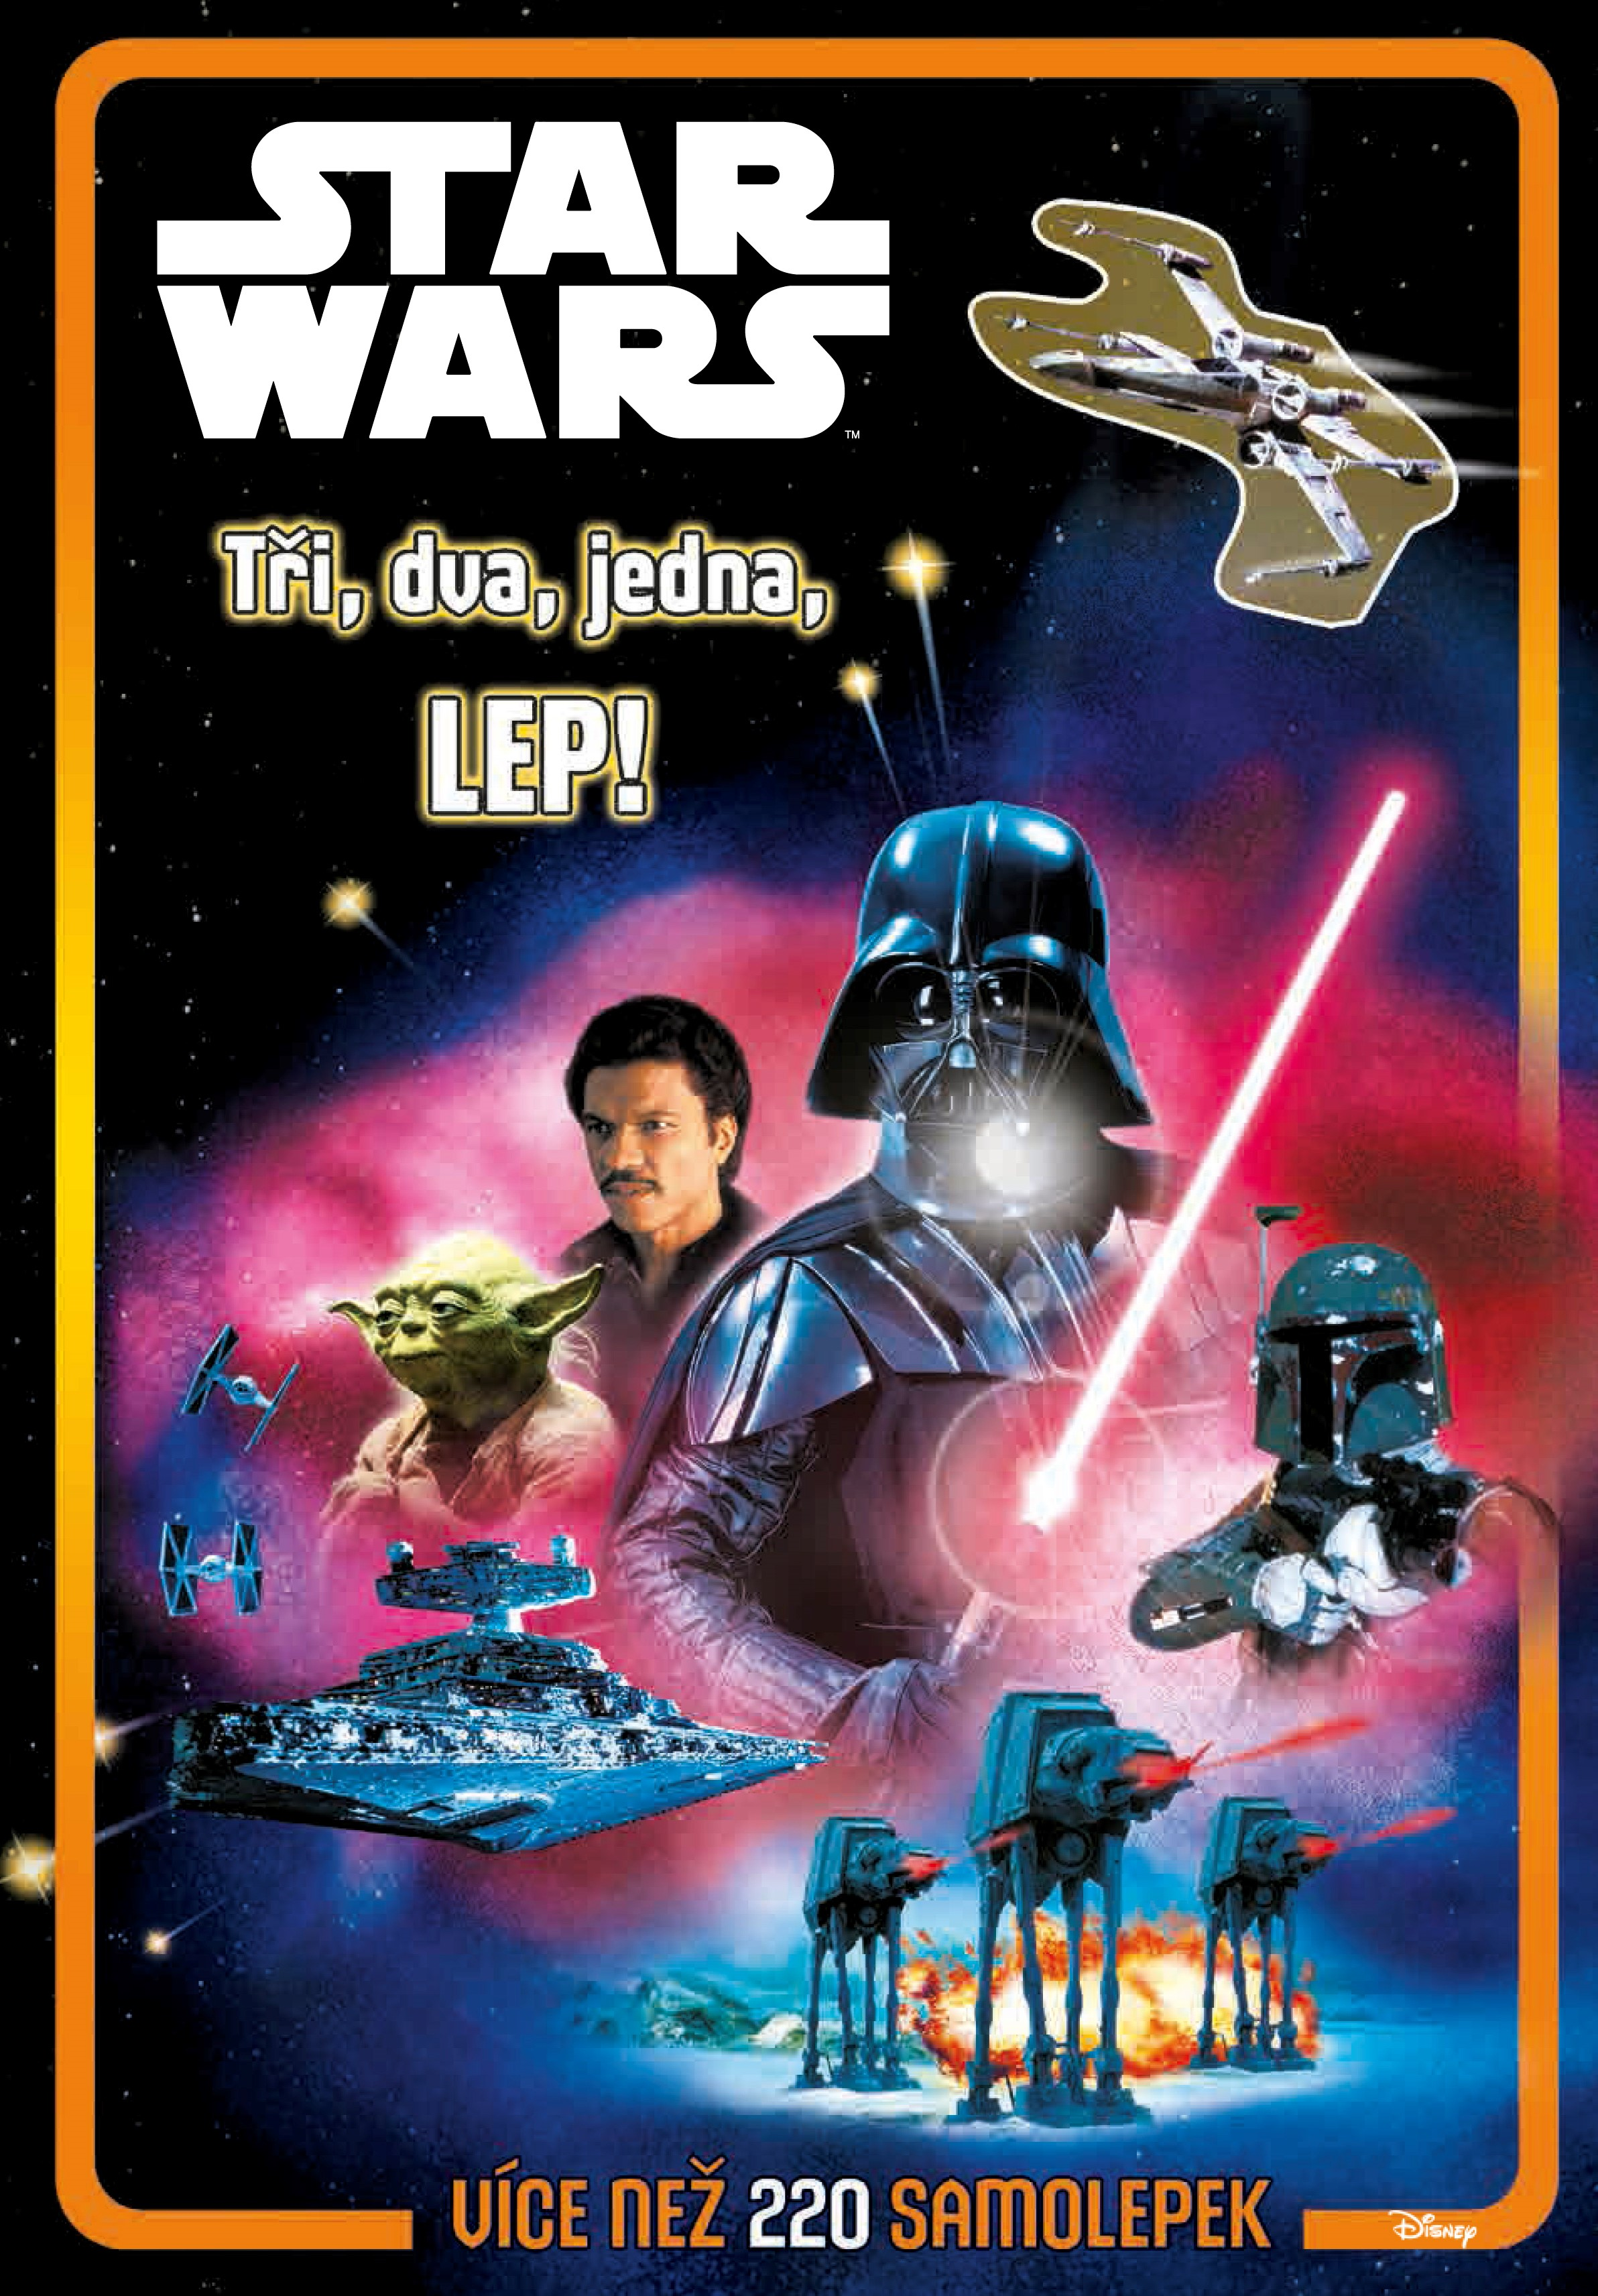 Star Wars - Tři, dva, jedna, lep! |